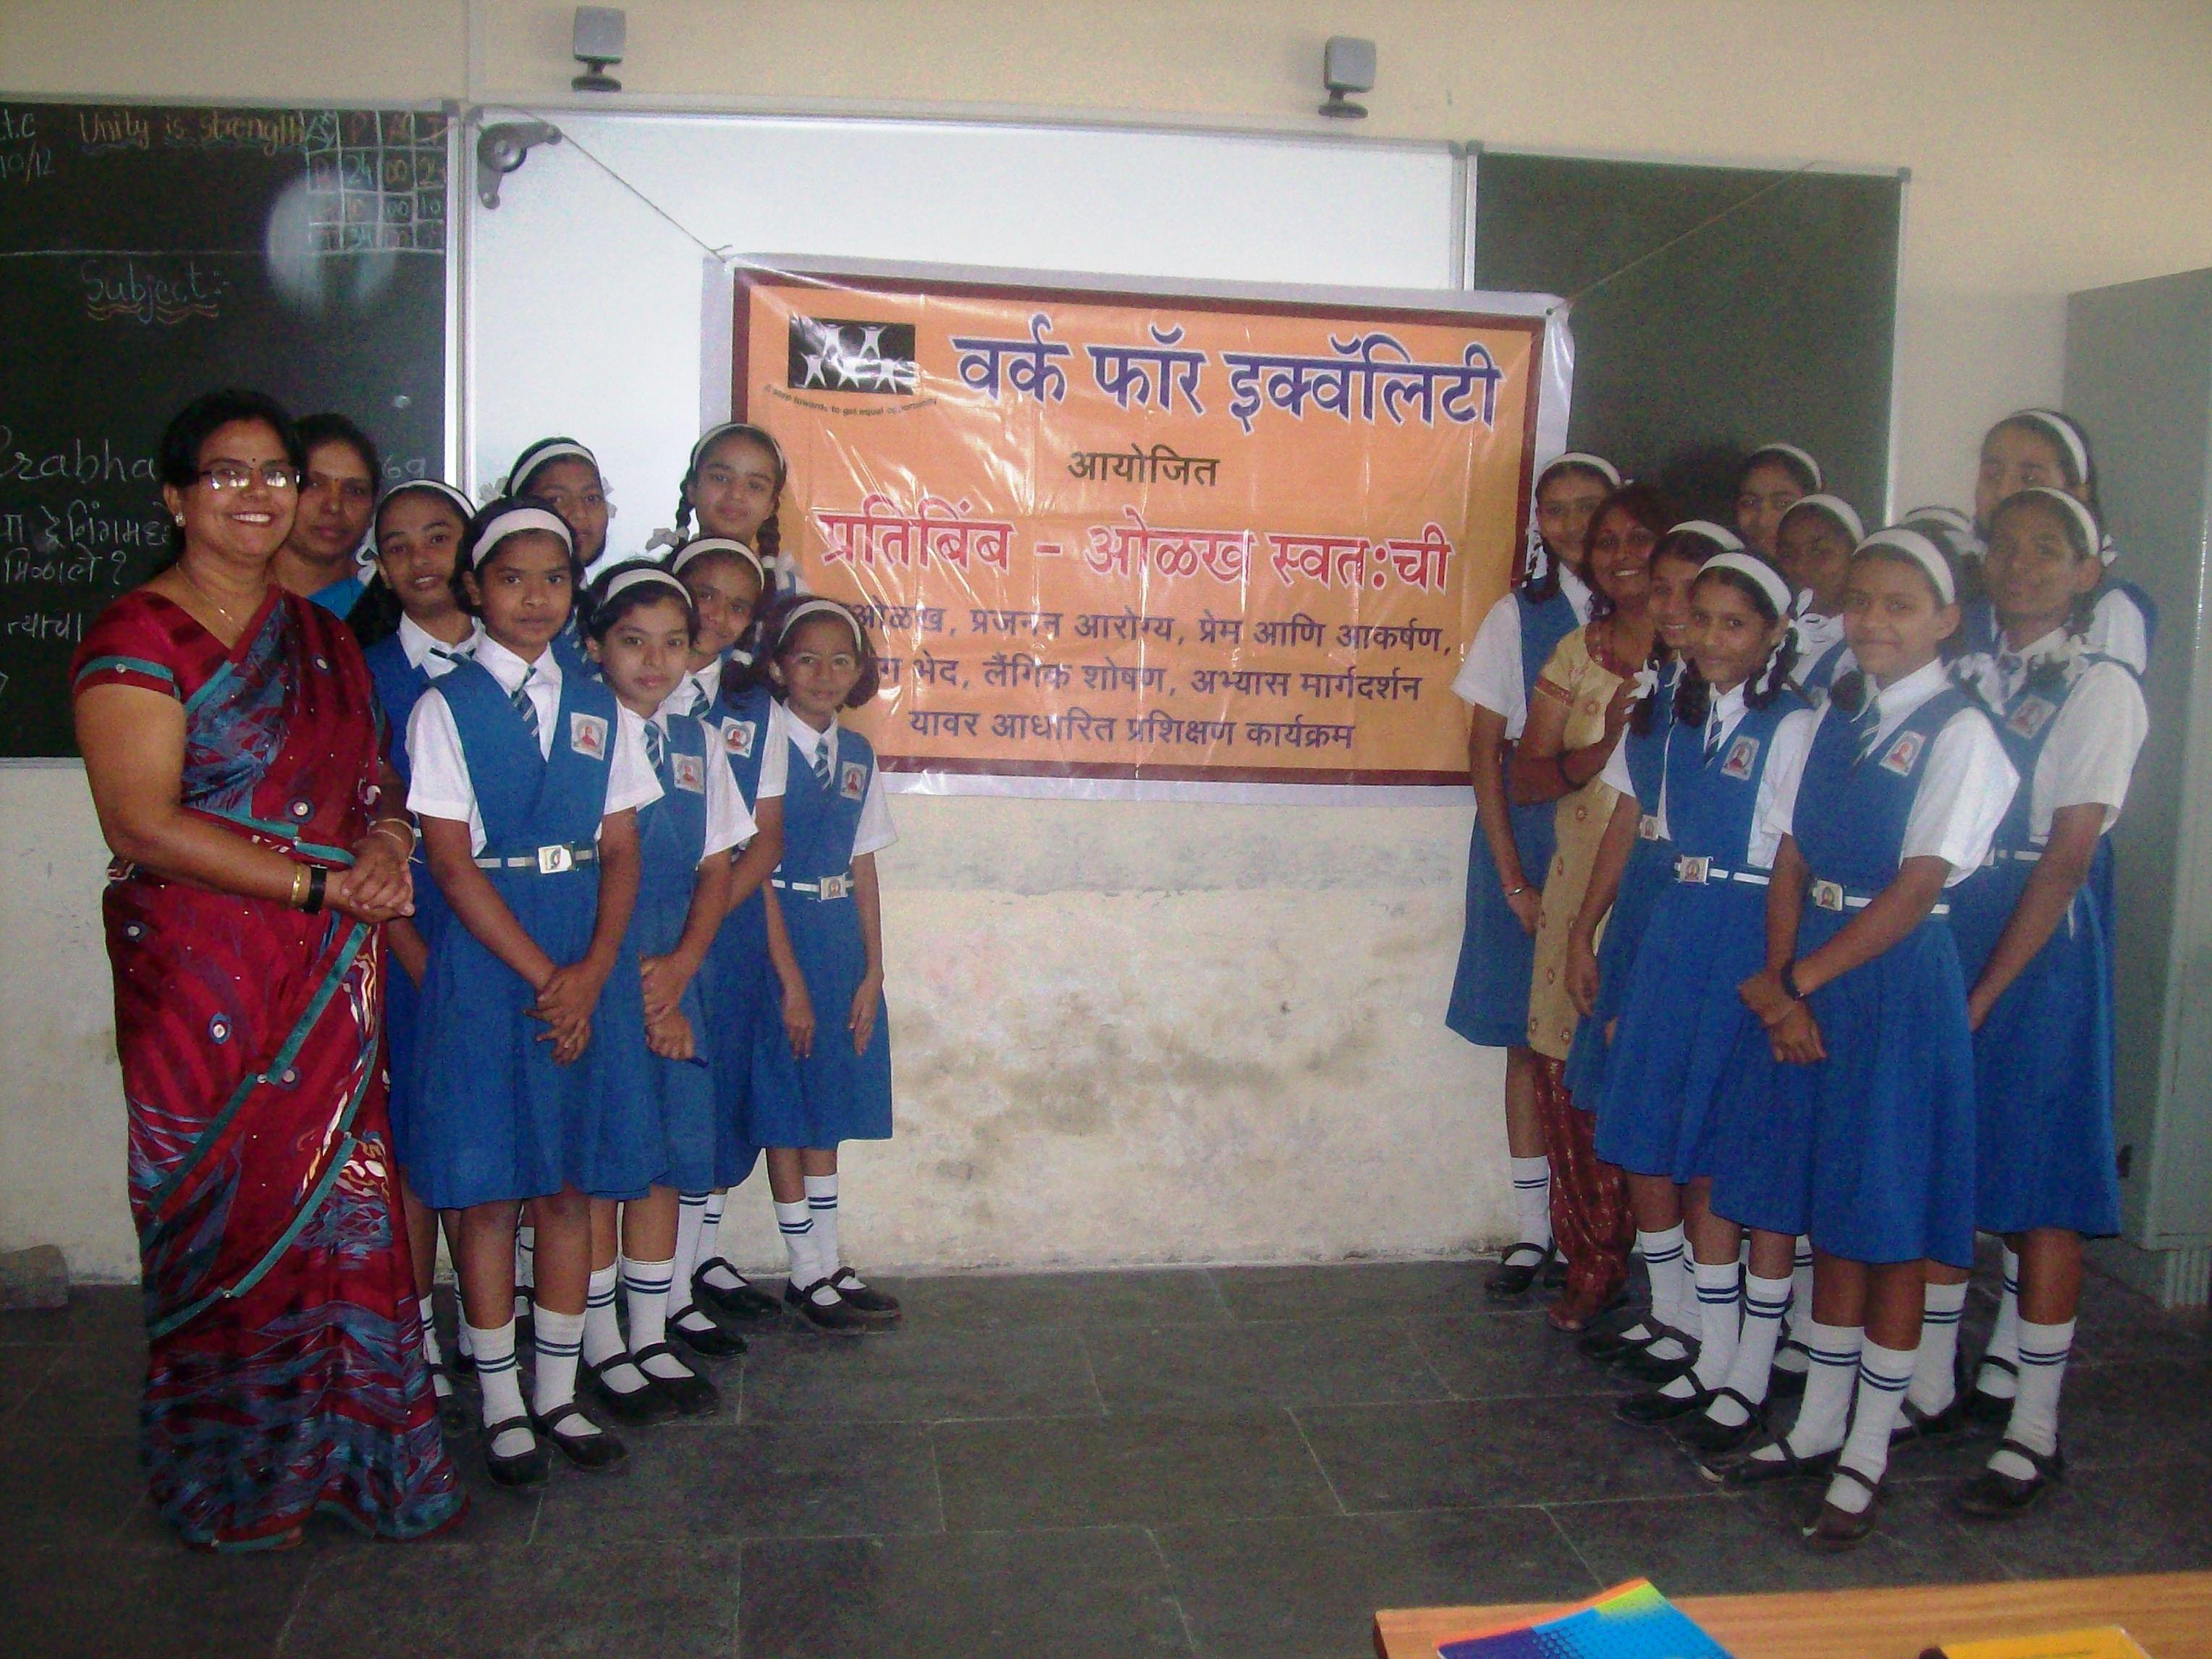 Swami Vivekanand School